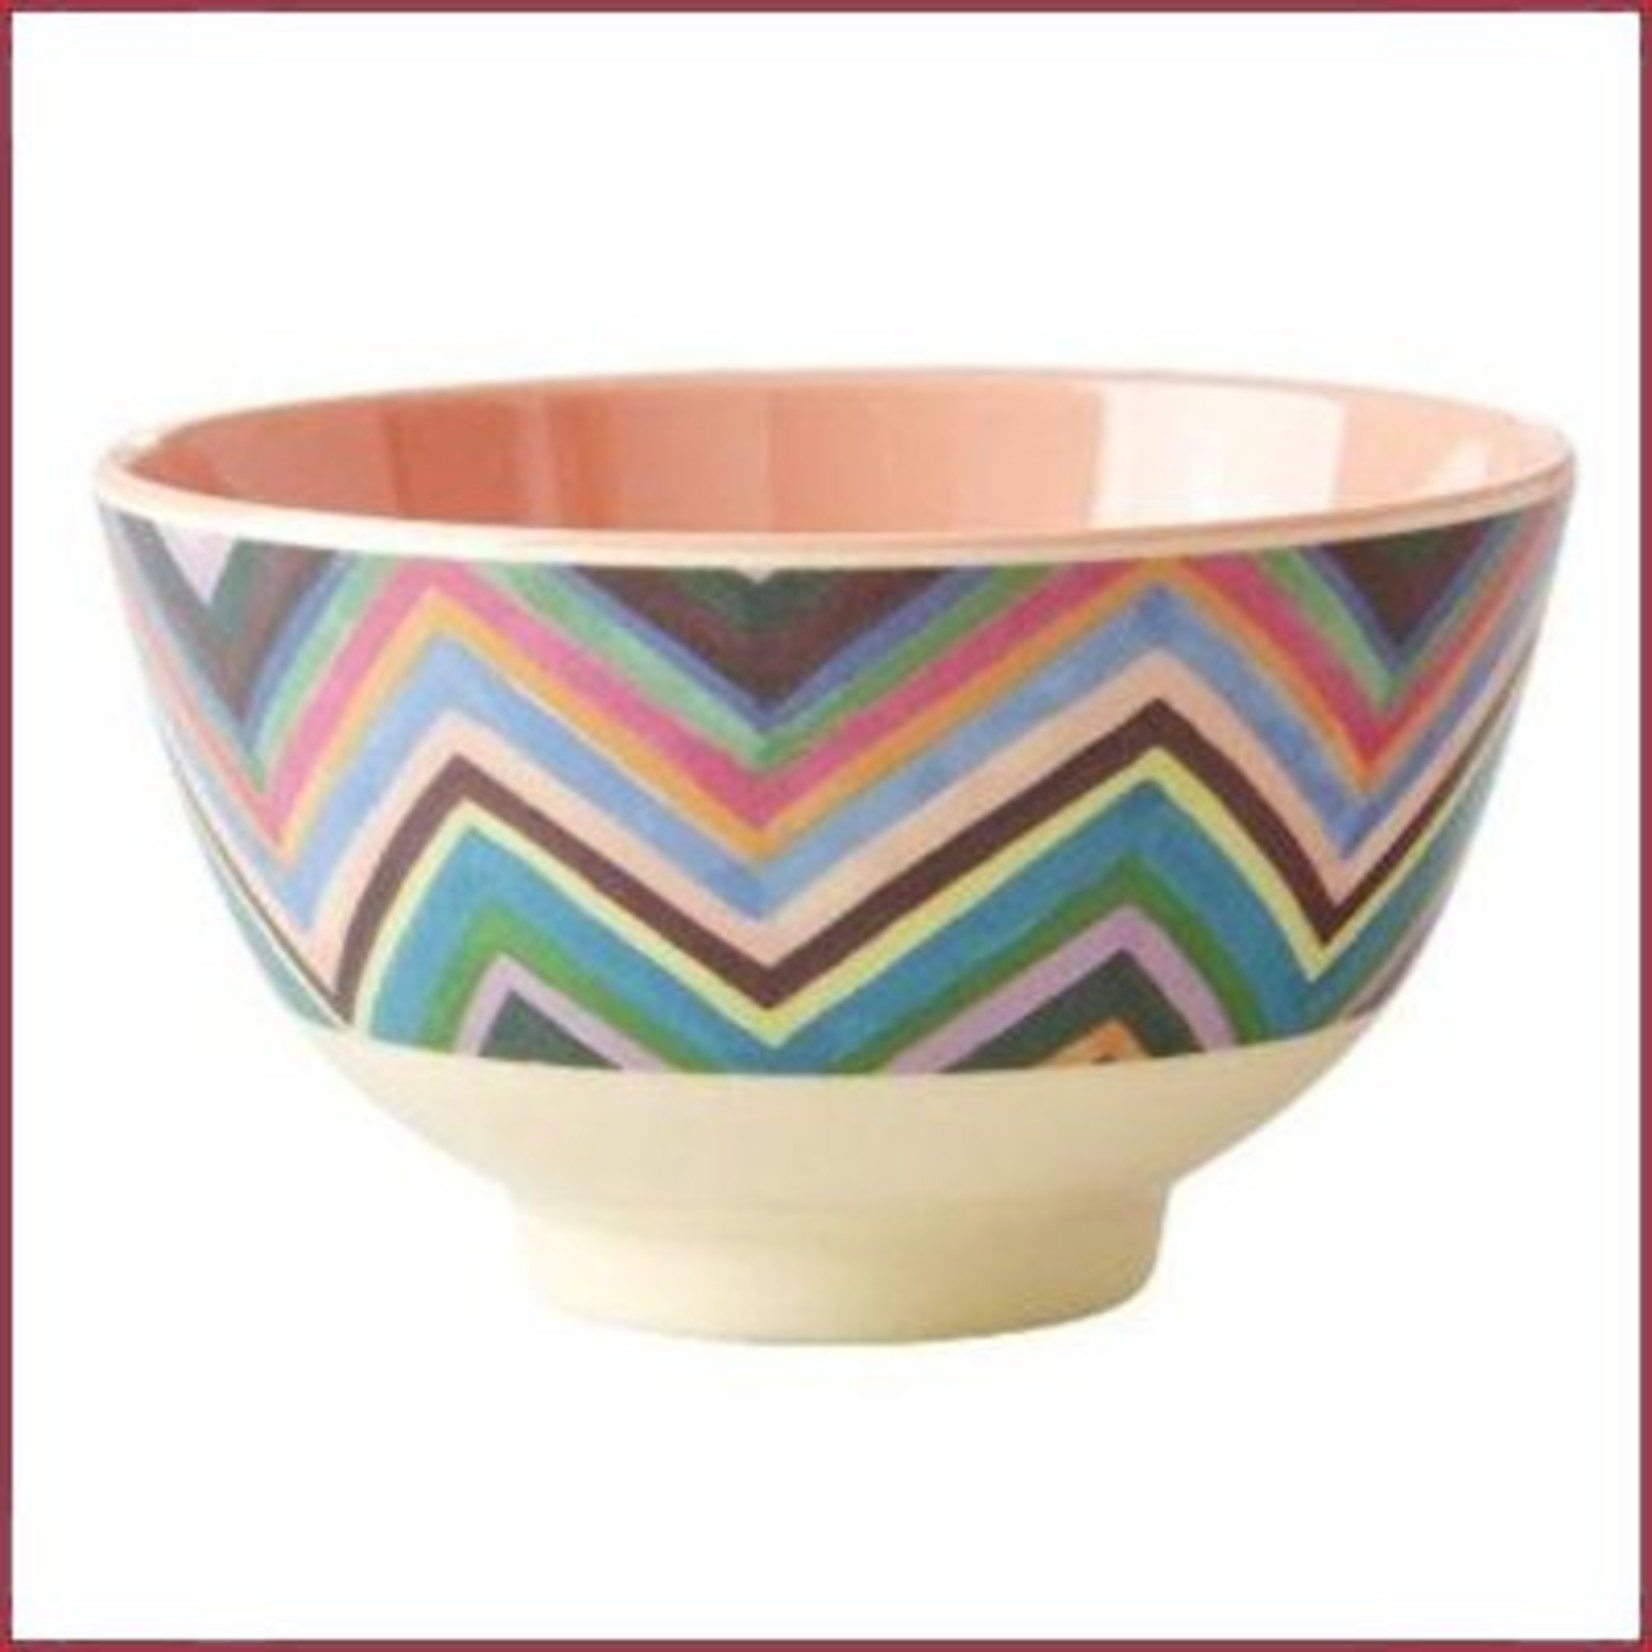 Rice Rice Bowl Small met ZIg Zag Print Two Tone